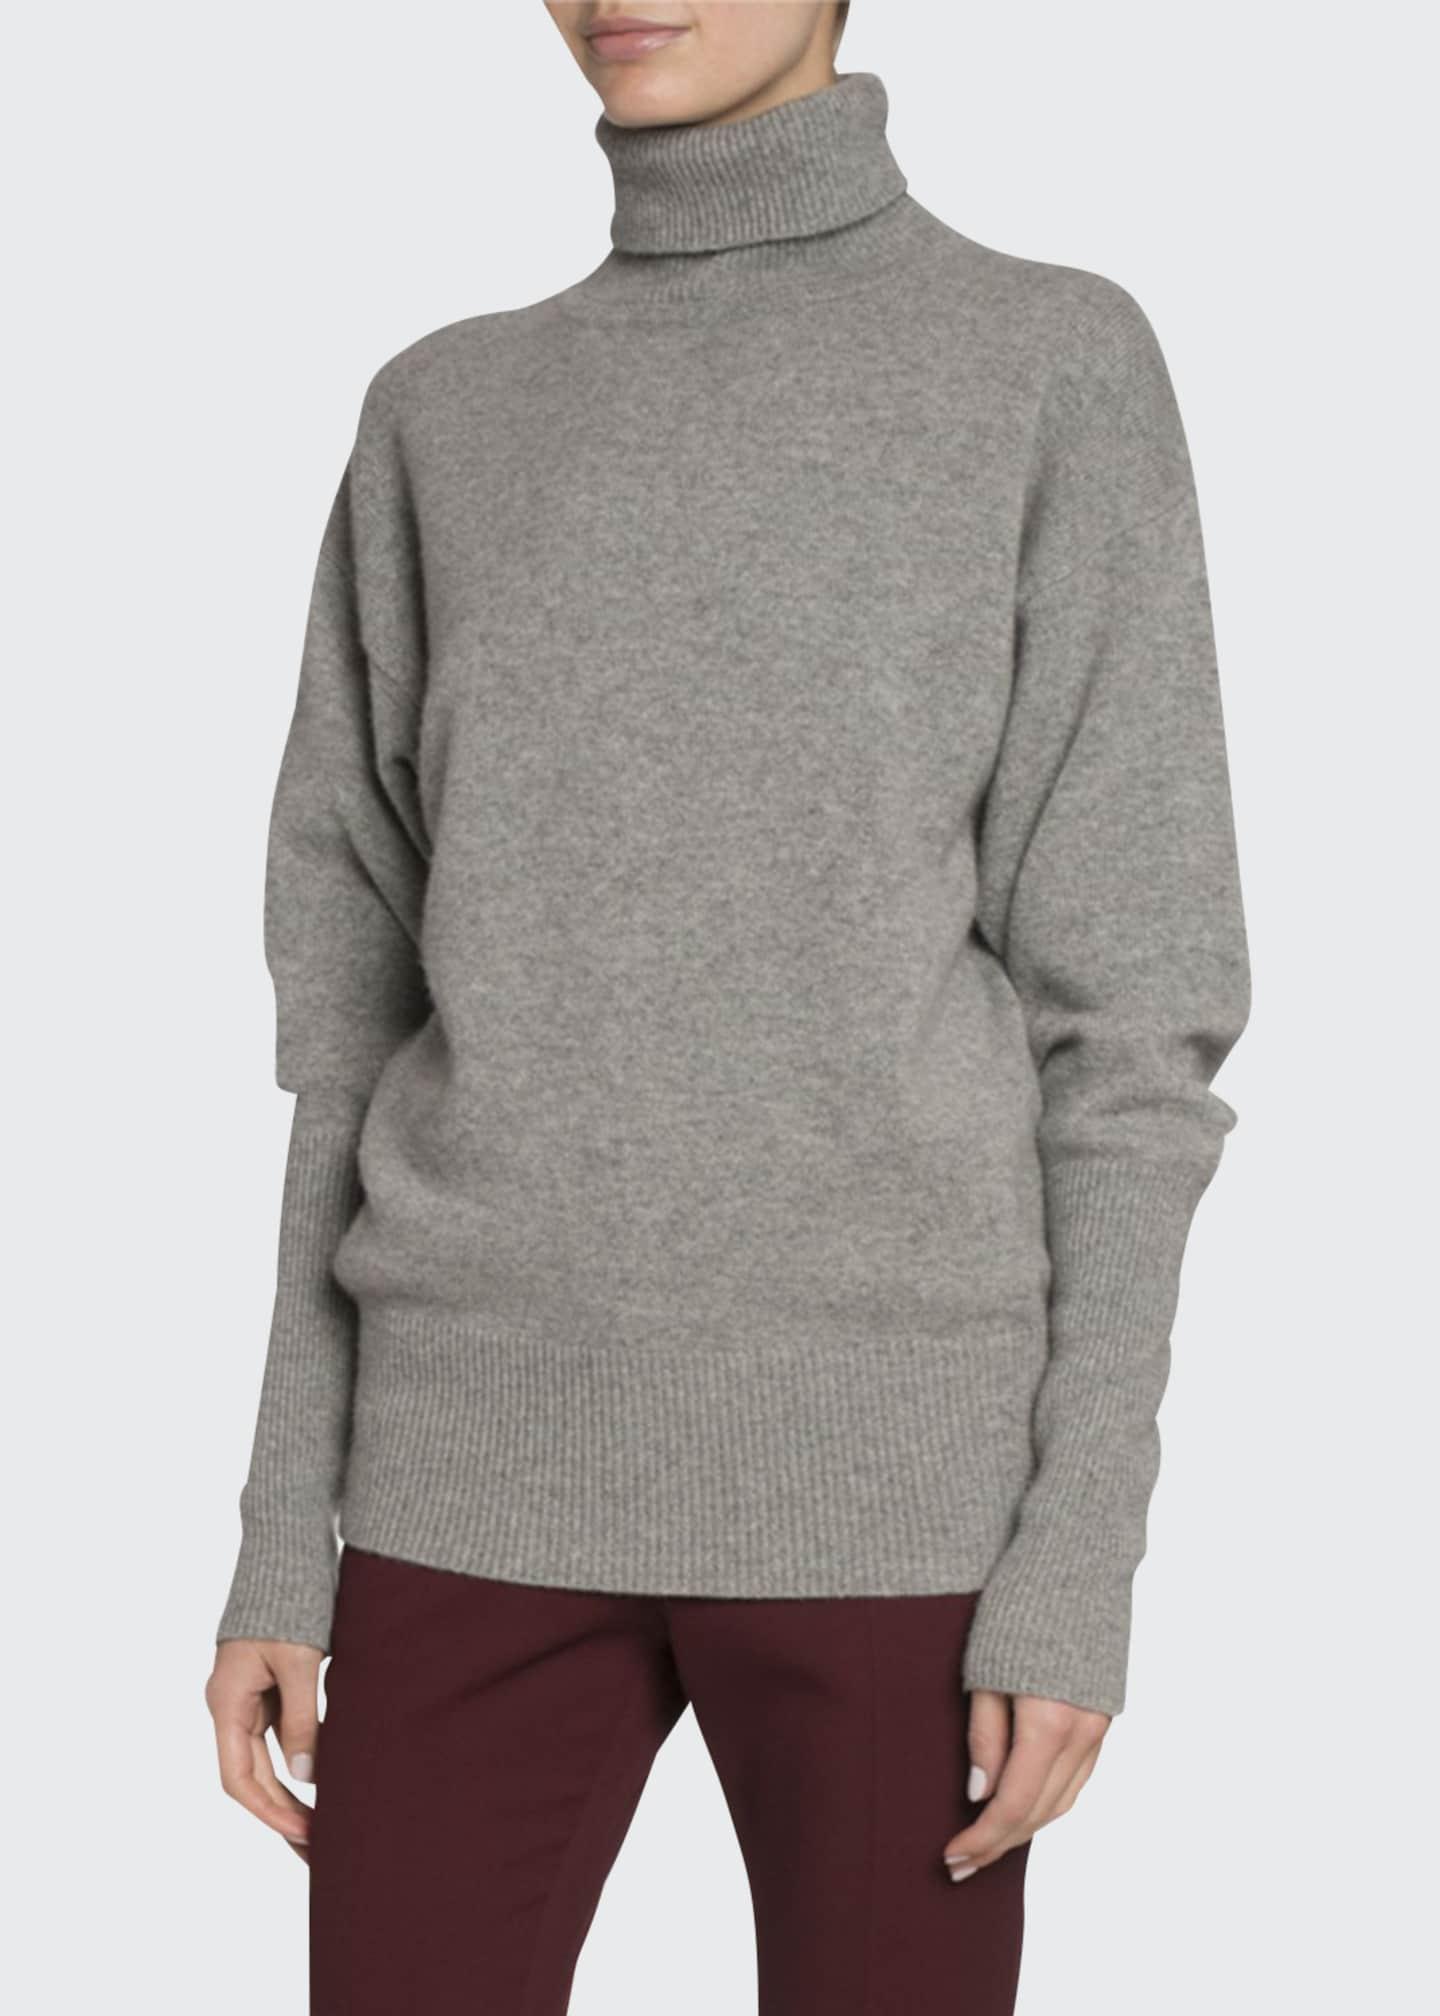 Victoria Beckham Cashmere Oversized Turtleneck Sweater